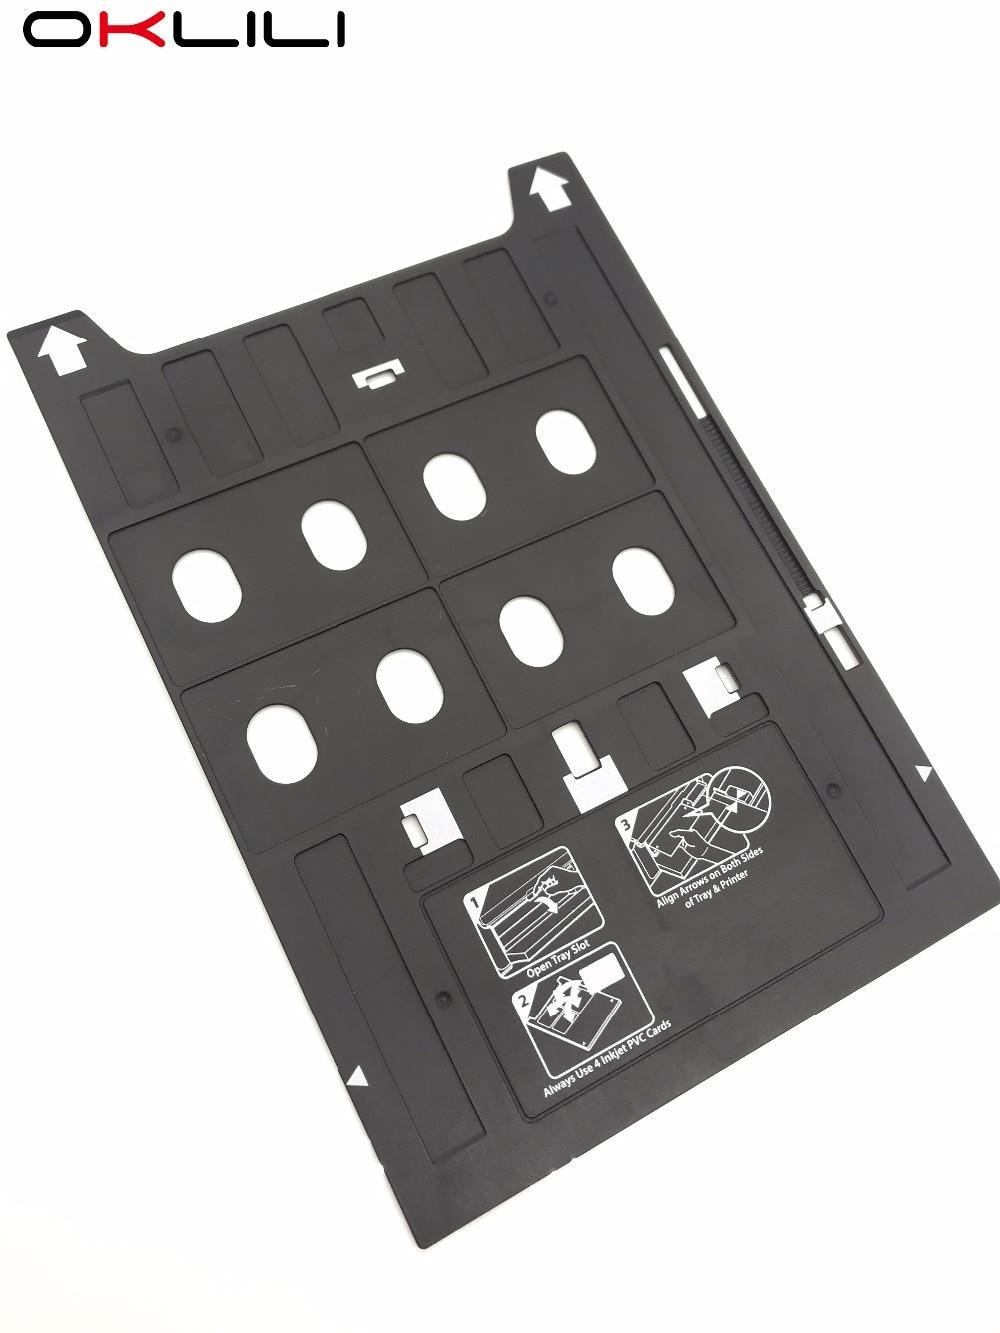 1PC X Plastic Inkjet PVC ID Card Printing Tray for Epson 1400 1410 1430 1430W 1500W R800 R1800 R1900 R2000 R2880 R3000 P400 P6001PC X Plastic Inkjet PVC ID Card Printing Tray for Epson 1400 1410 1430 1430W 1500W R800 R1800 R1900 R2000 R2880 R3000 P400 P600